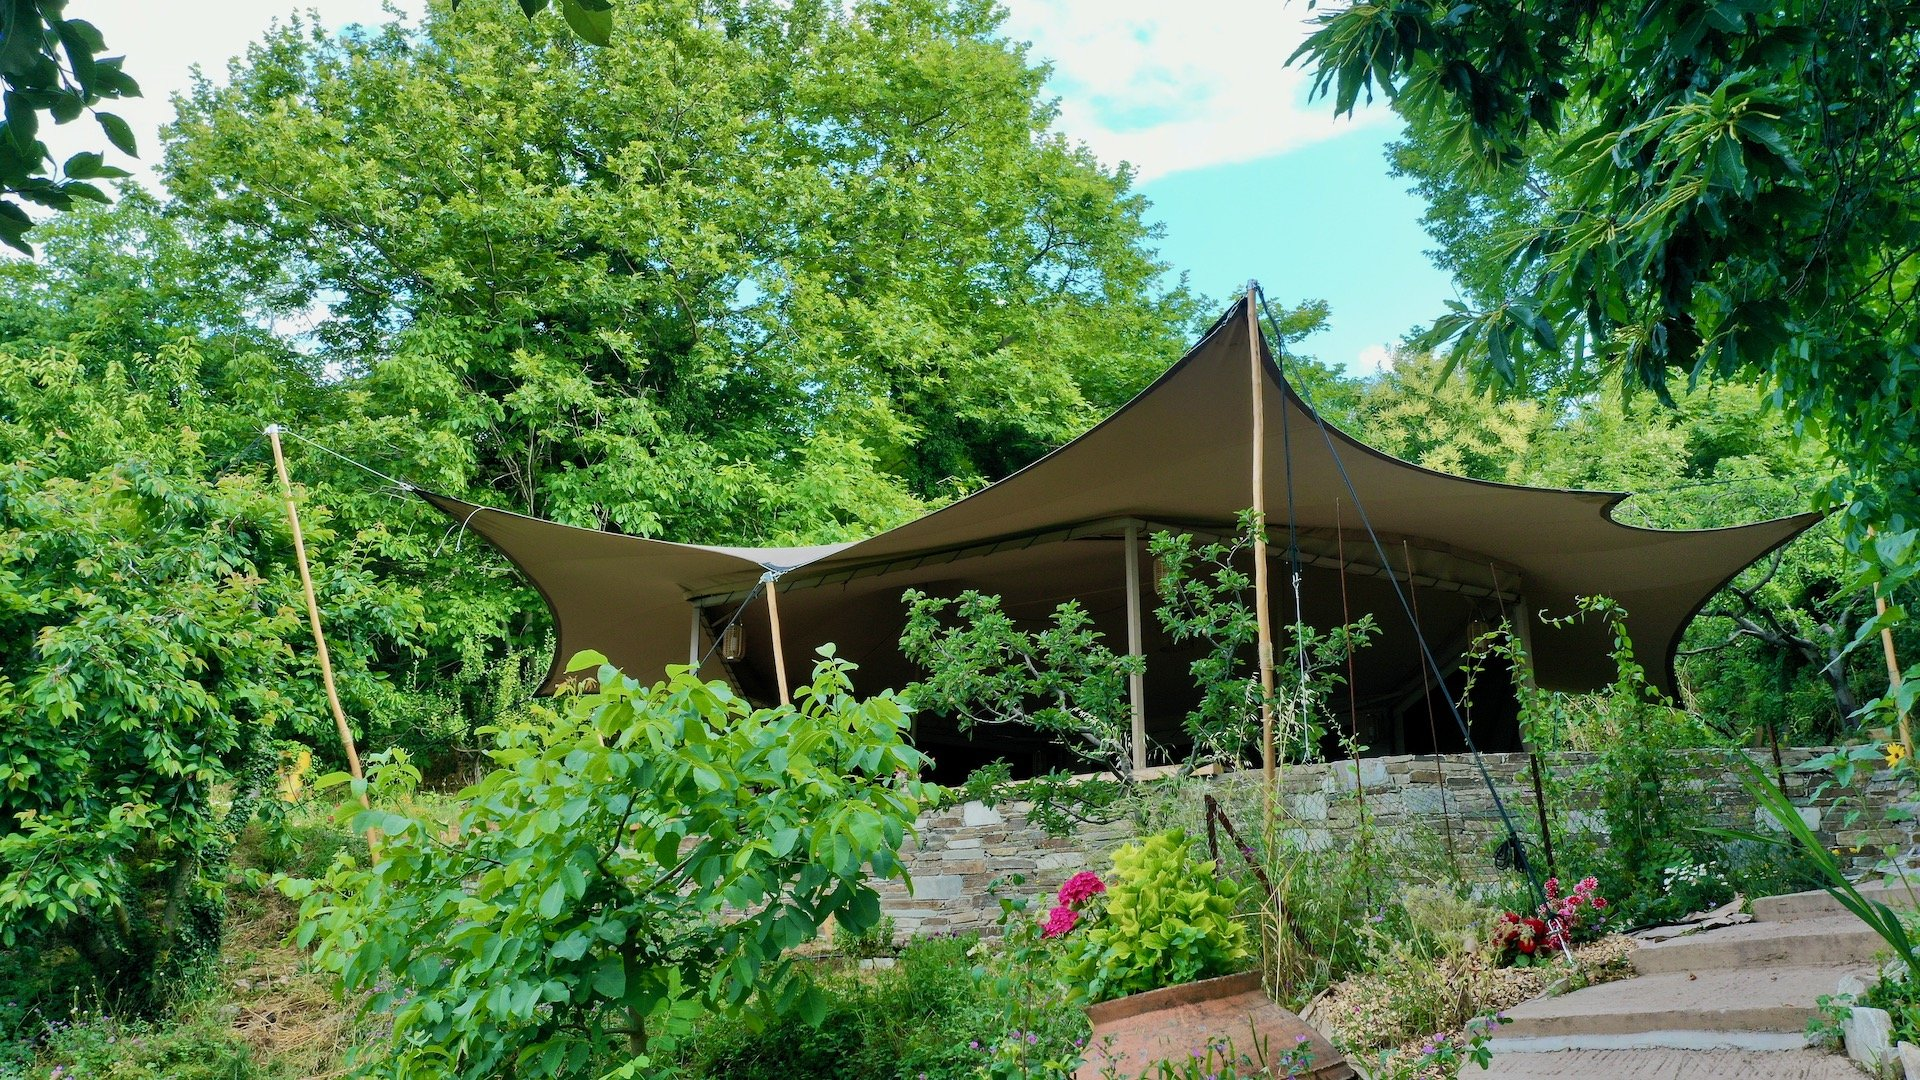 Pelion Homes Retreat Centre blends into nature